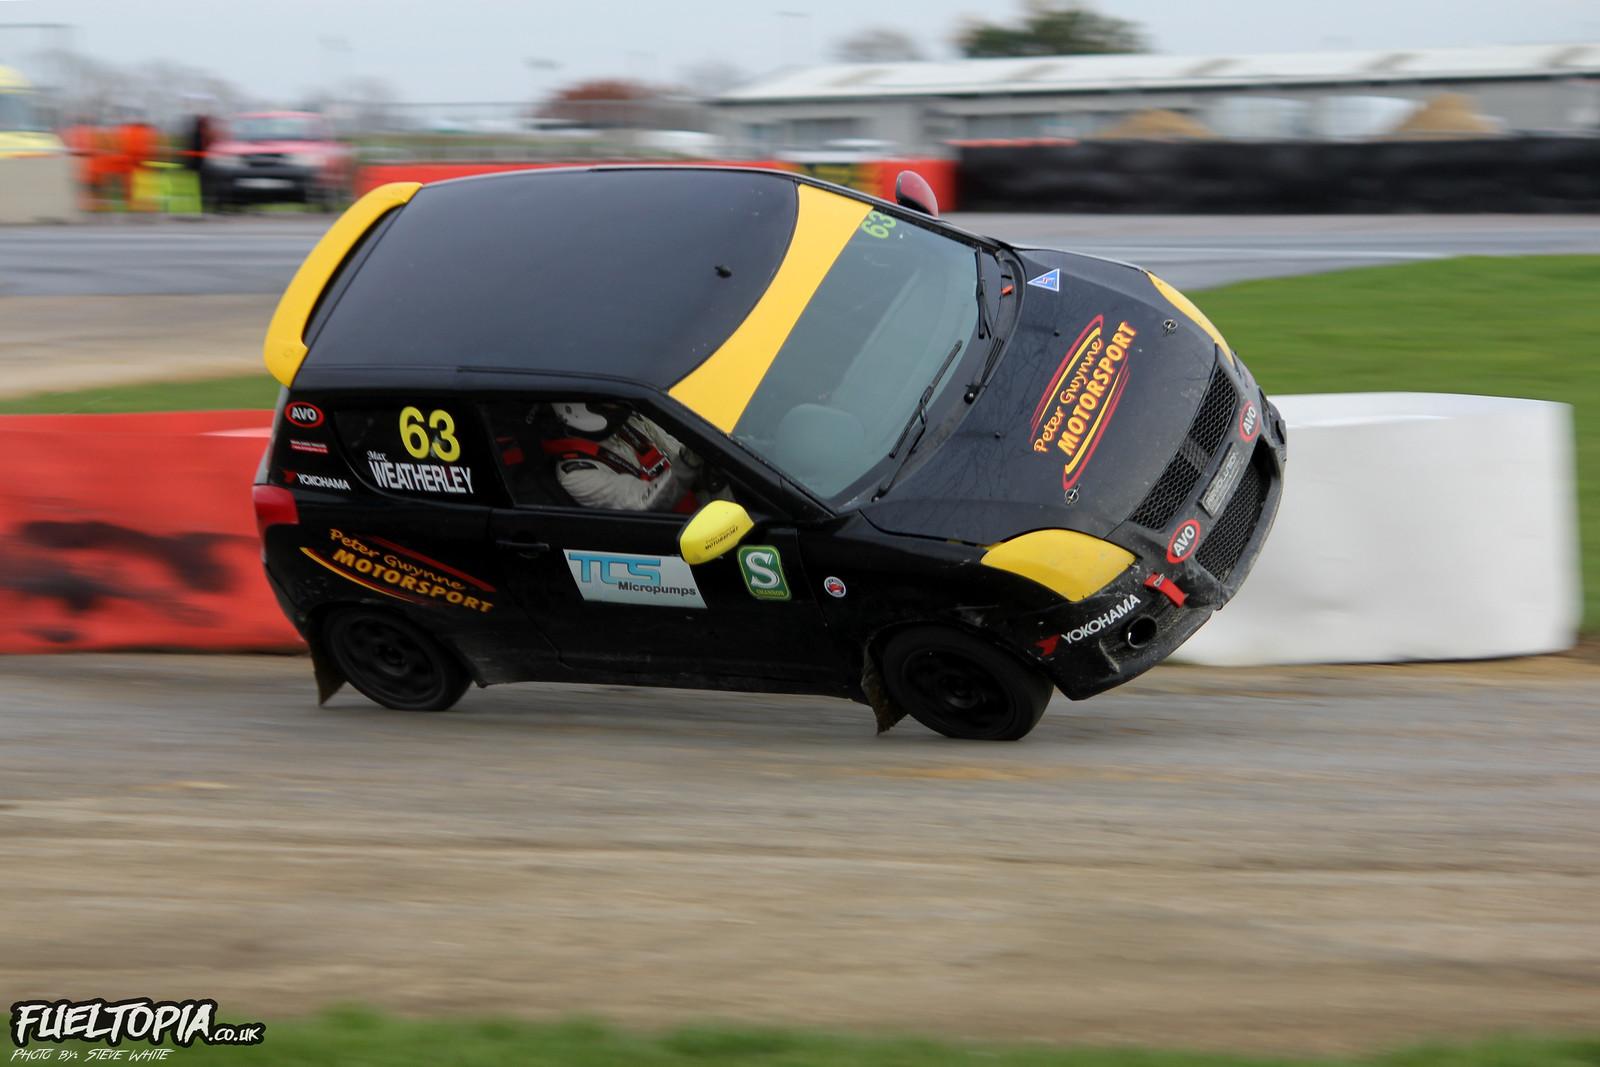 Max Weatherley Suzuki Swift Silverstone BRX British Rallycross Championship 2018 Steve White Fueltopia